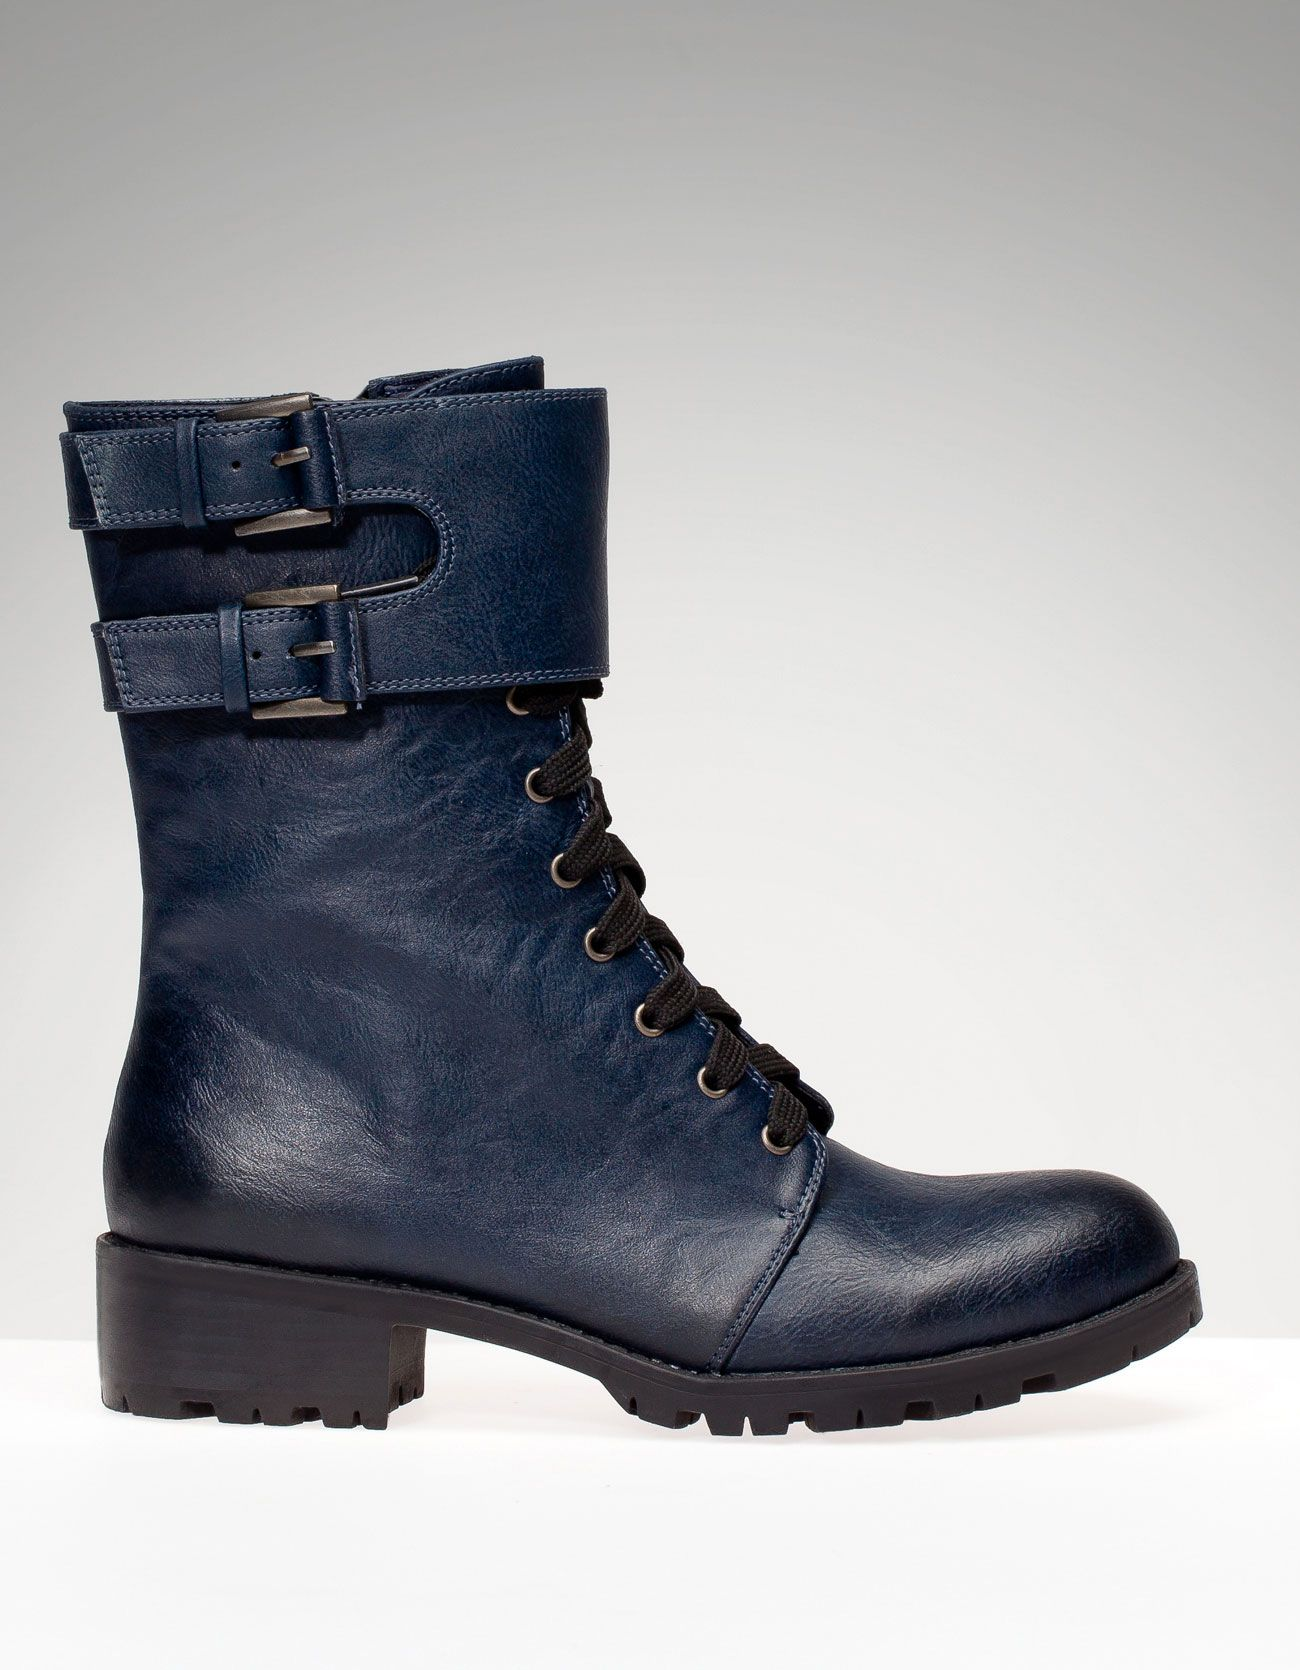 Stradivarius Botin Plano Militar Cordones Boots Blue Boots Fun Heels